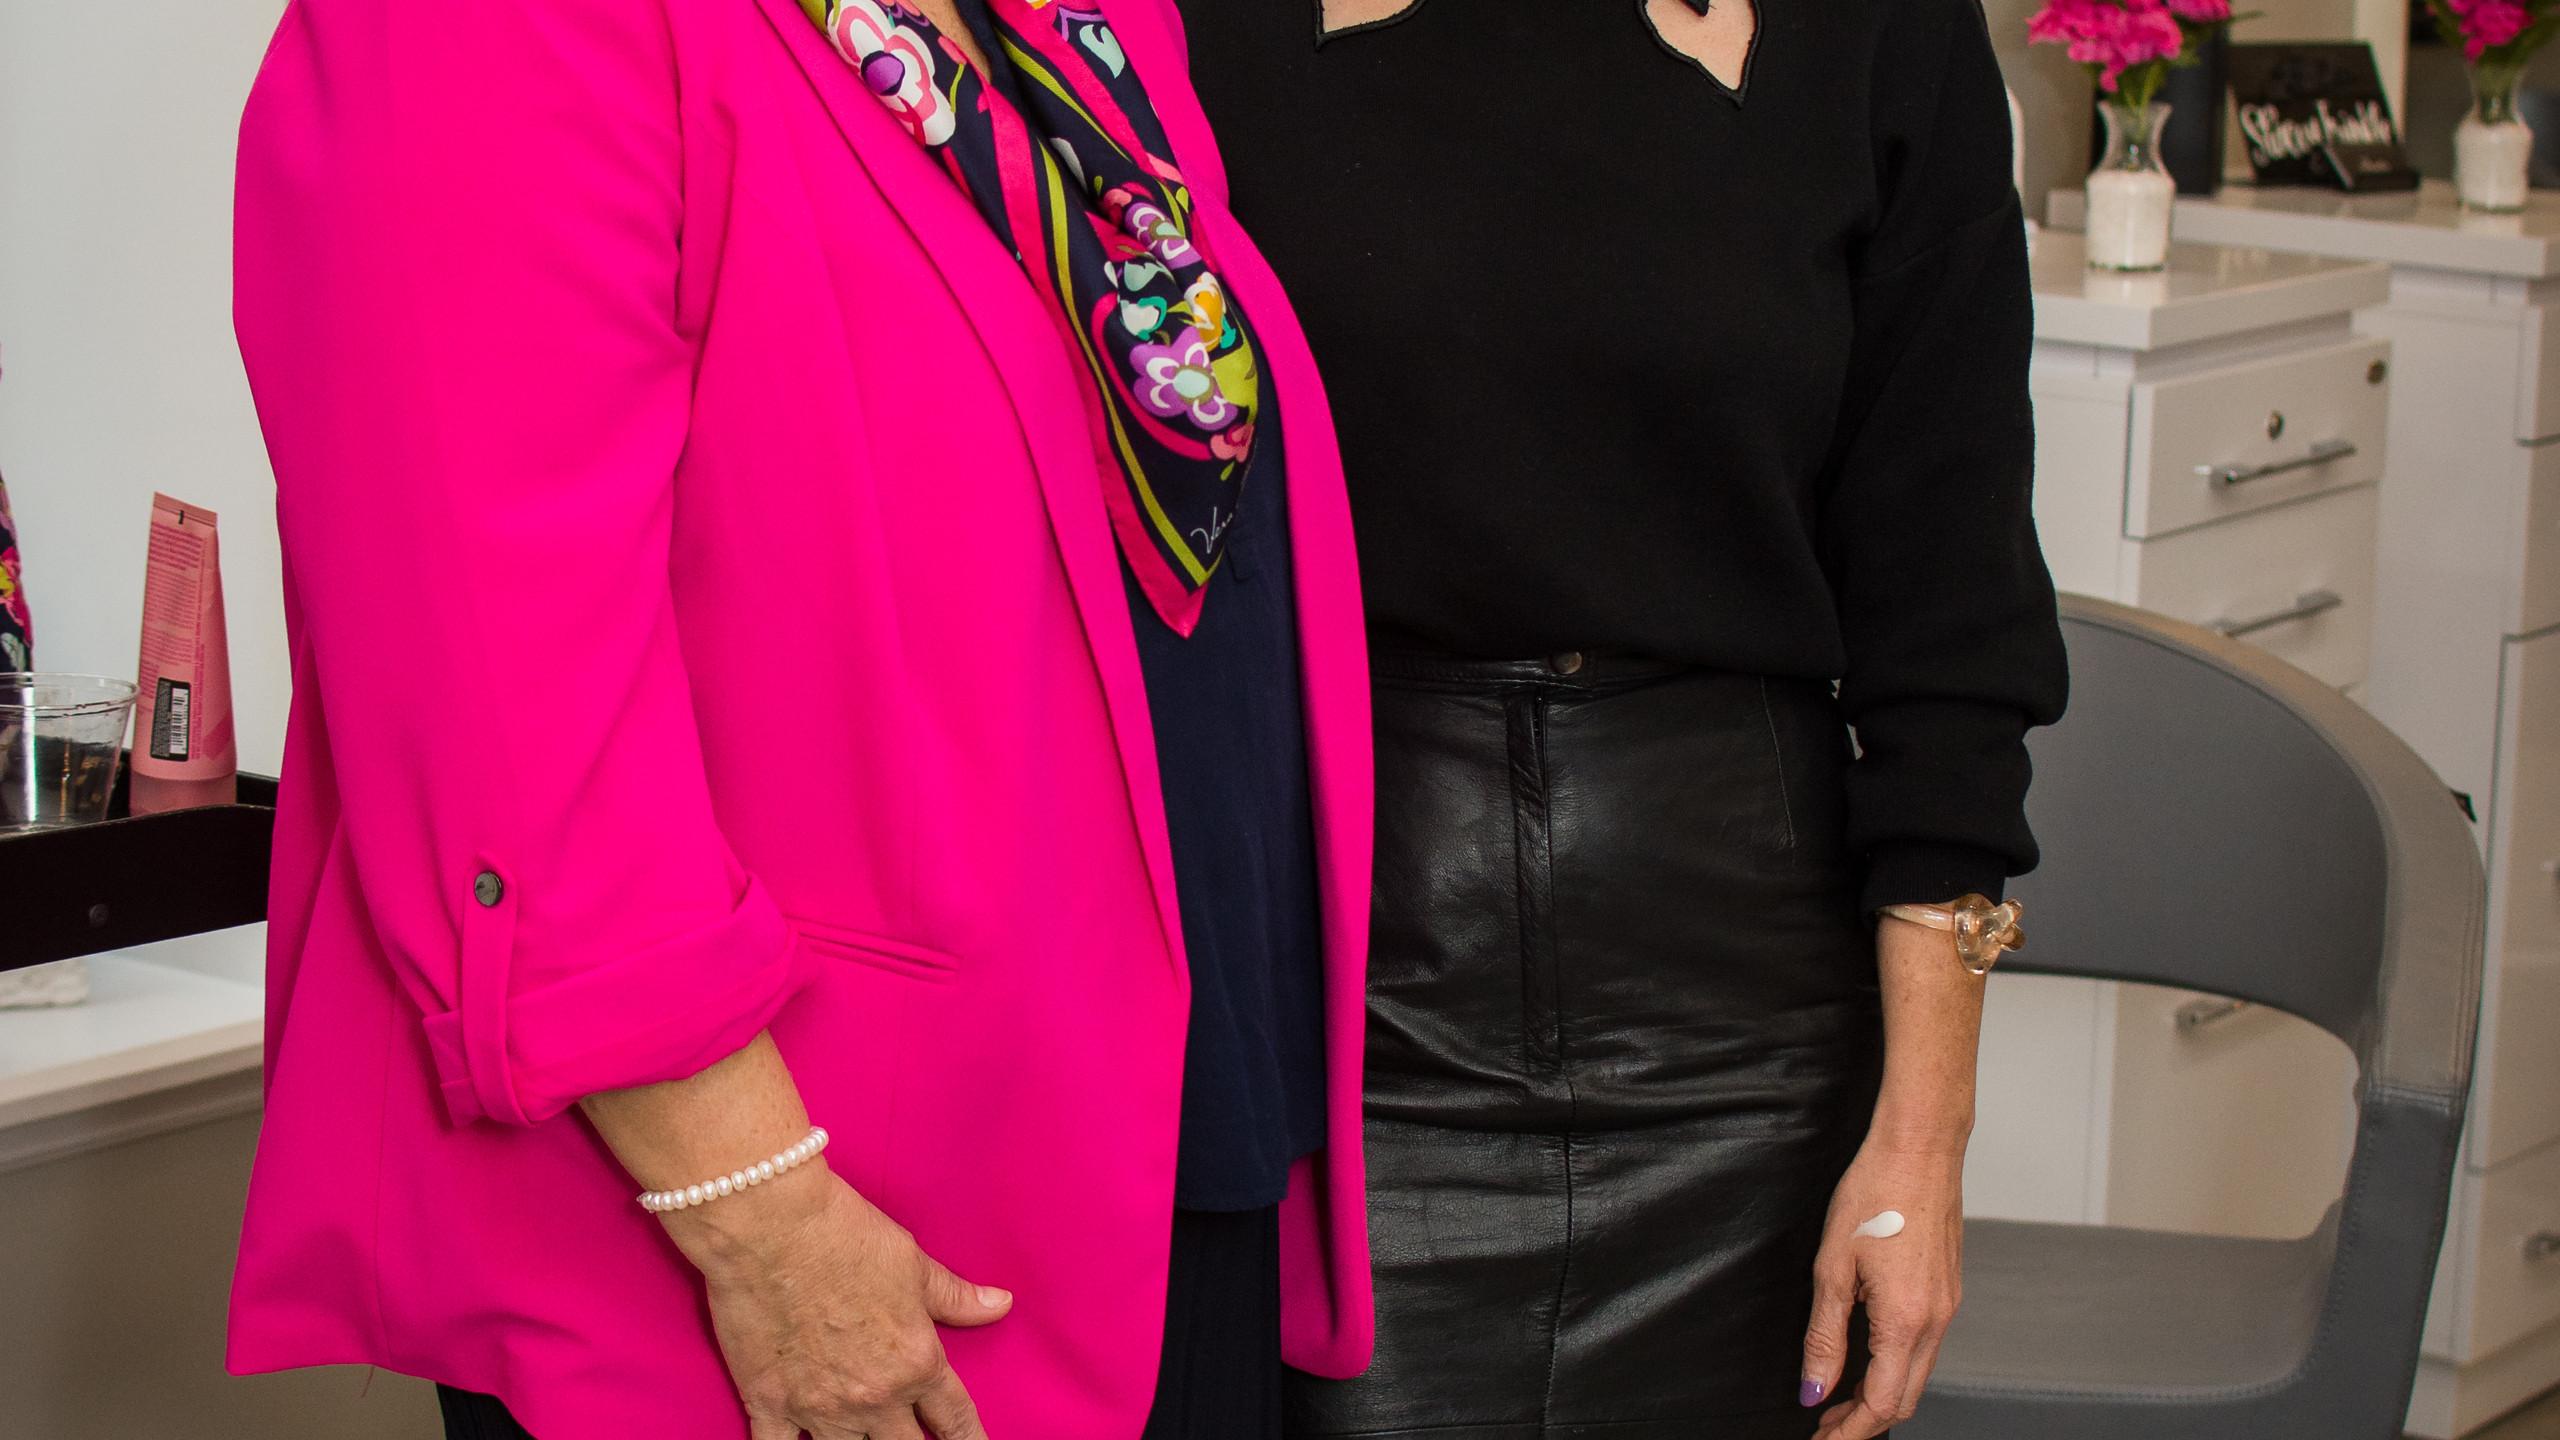 Brenda Watts and Patti Bankston